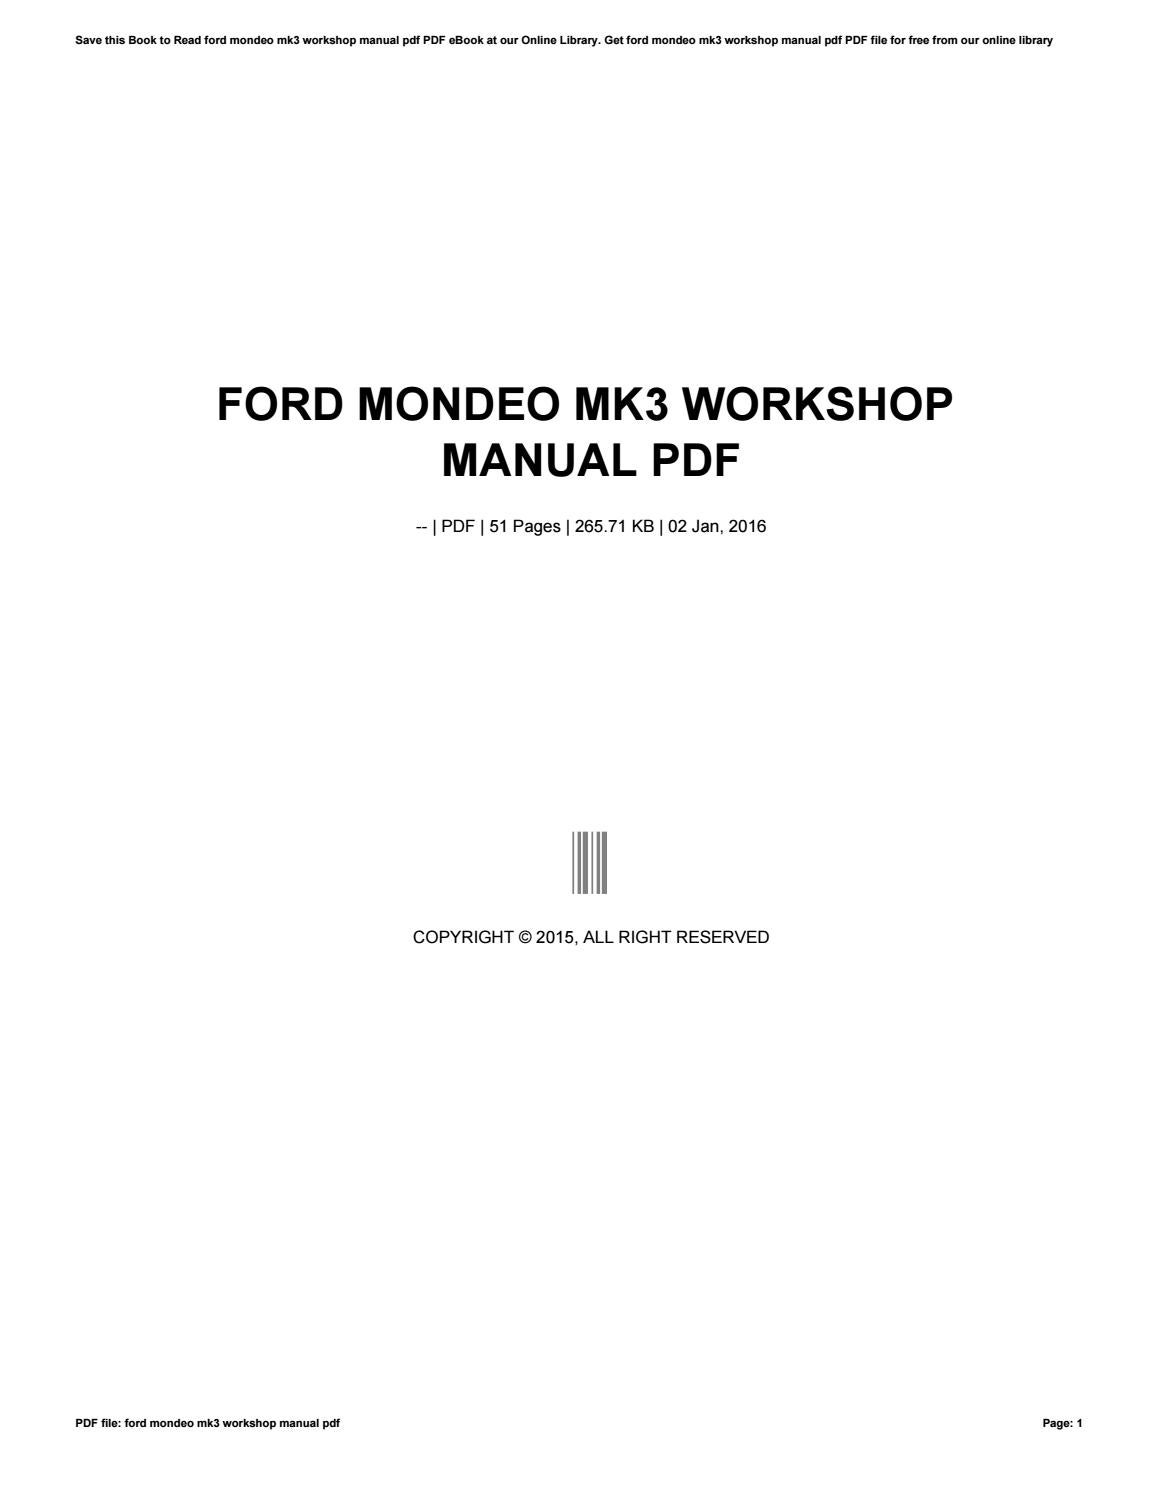 Manual Ford Mondeo Mk3 Pdf 2019 Ebook Library